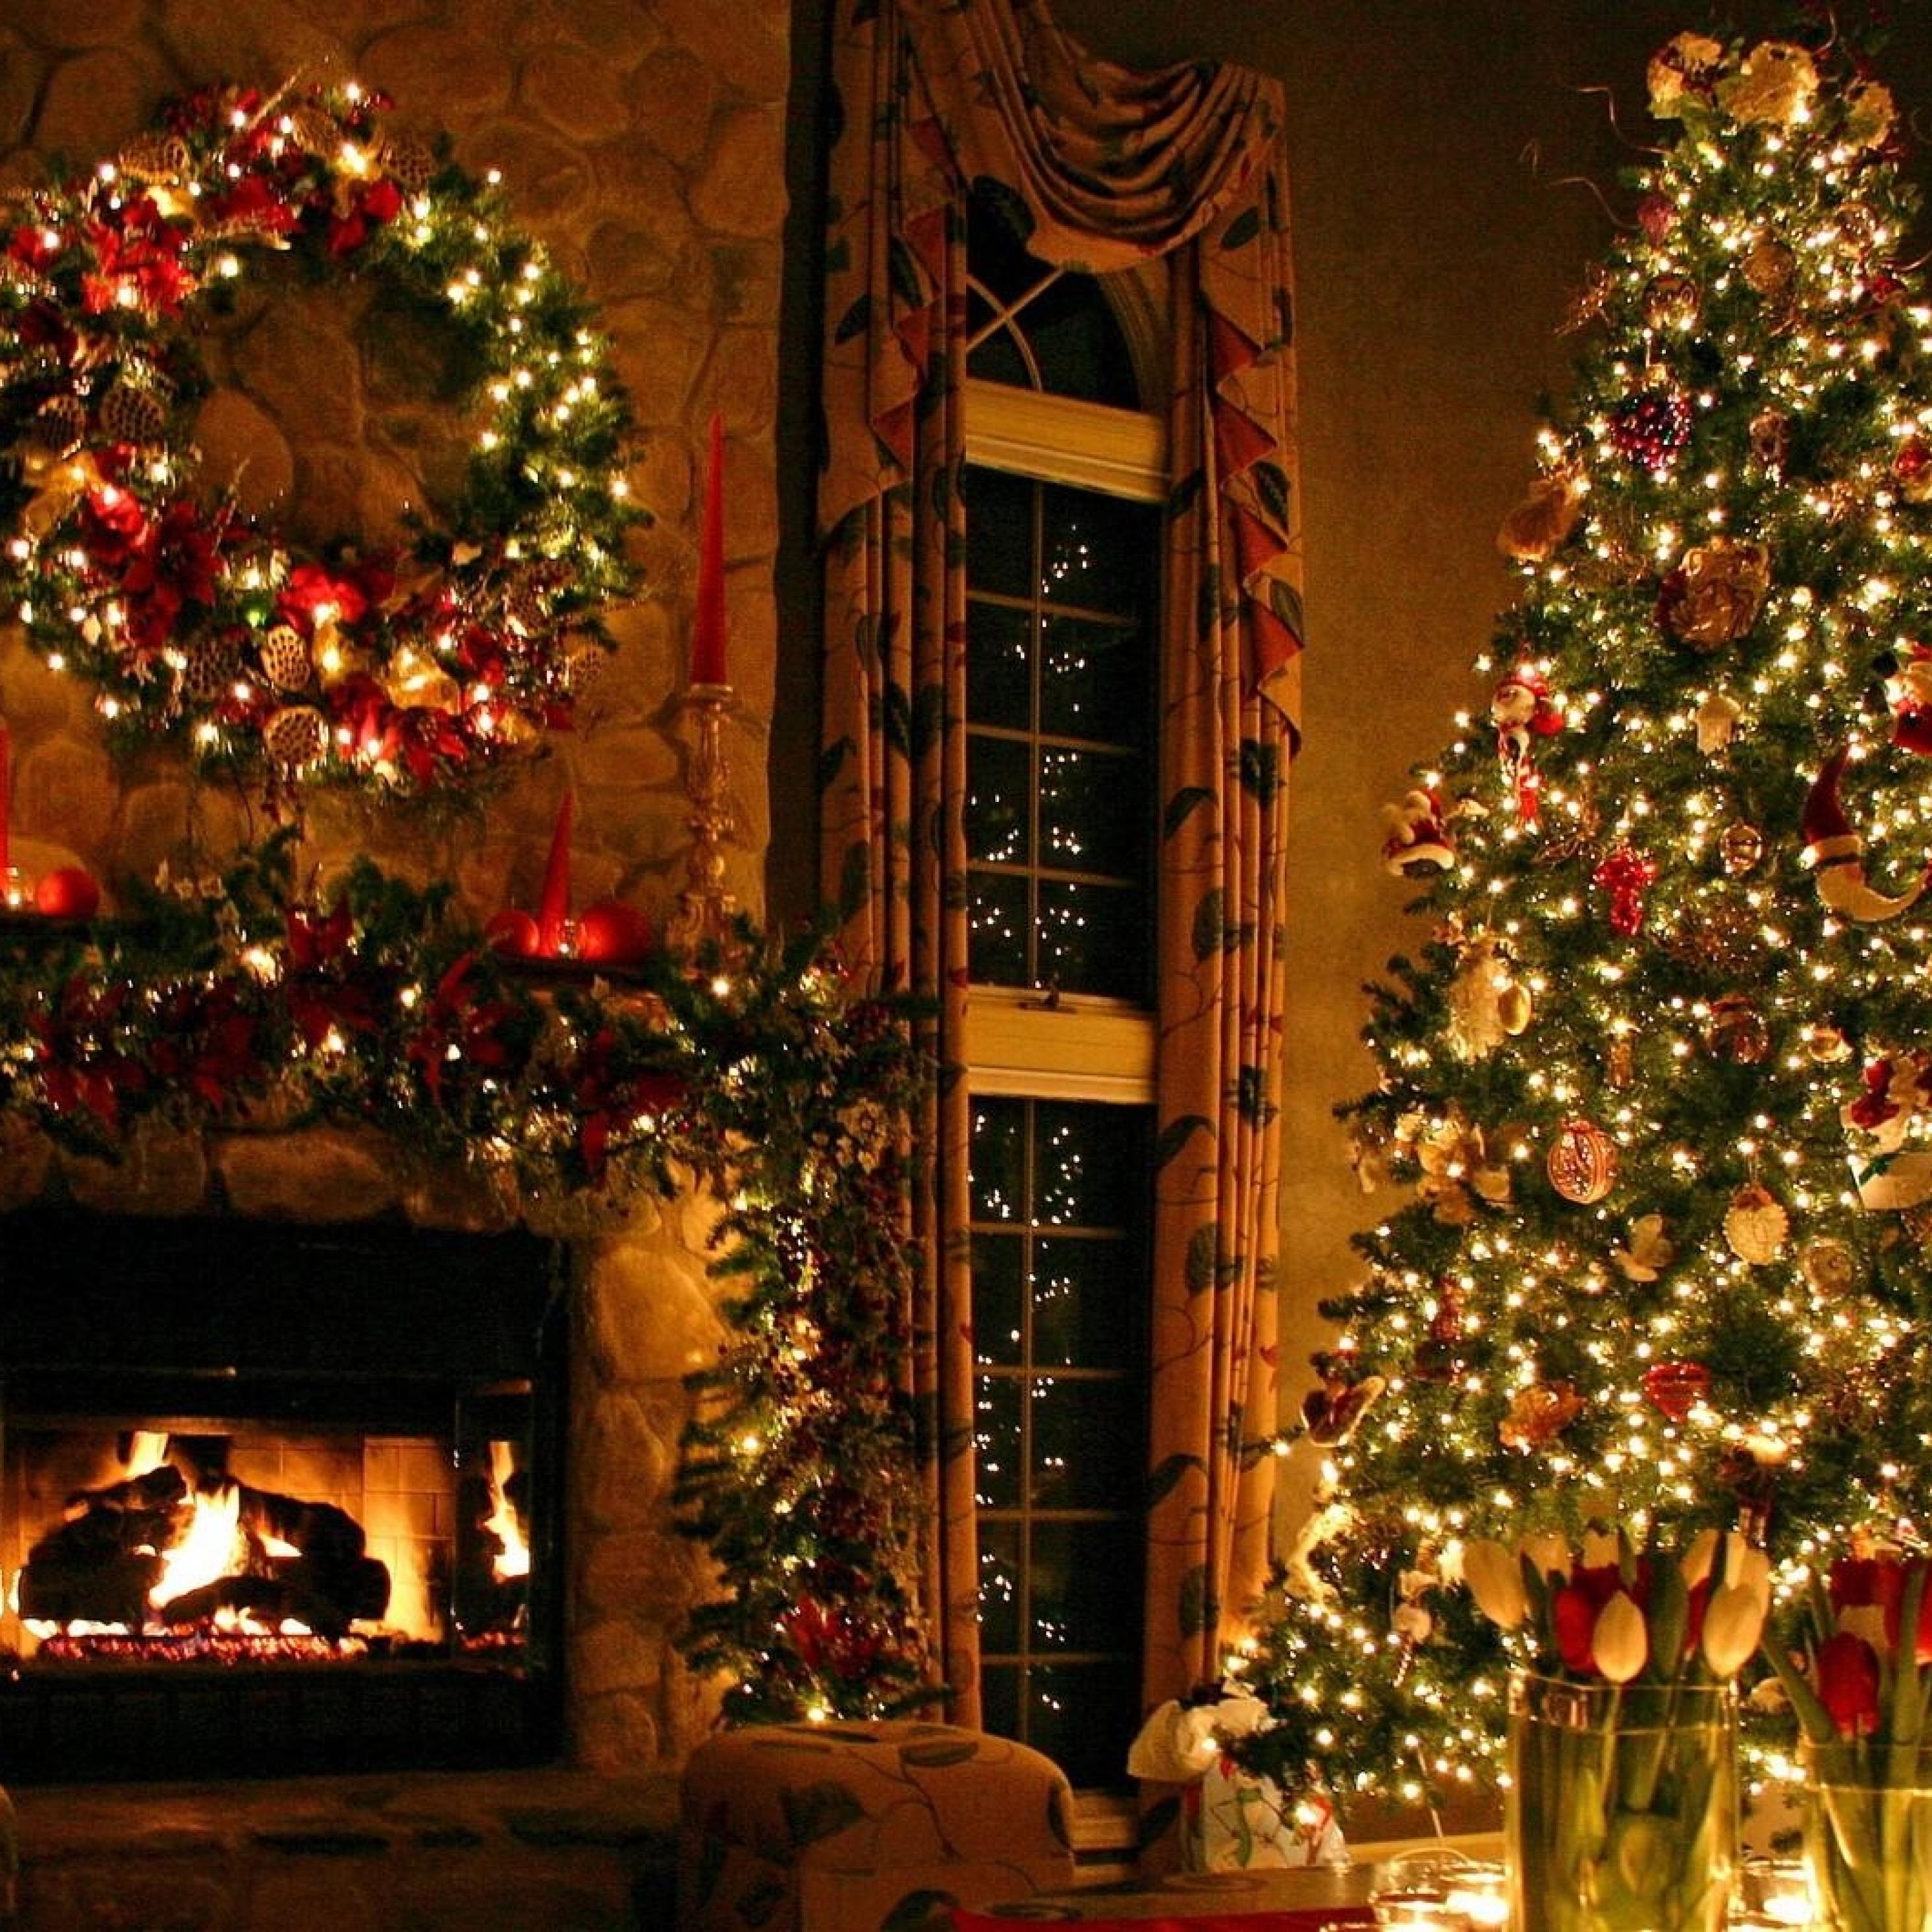 2932x2932 christmas tree ornaments fireplace Ipad Pro Retina 2932x2932